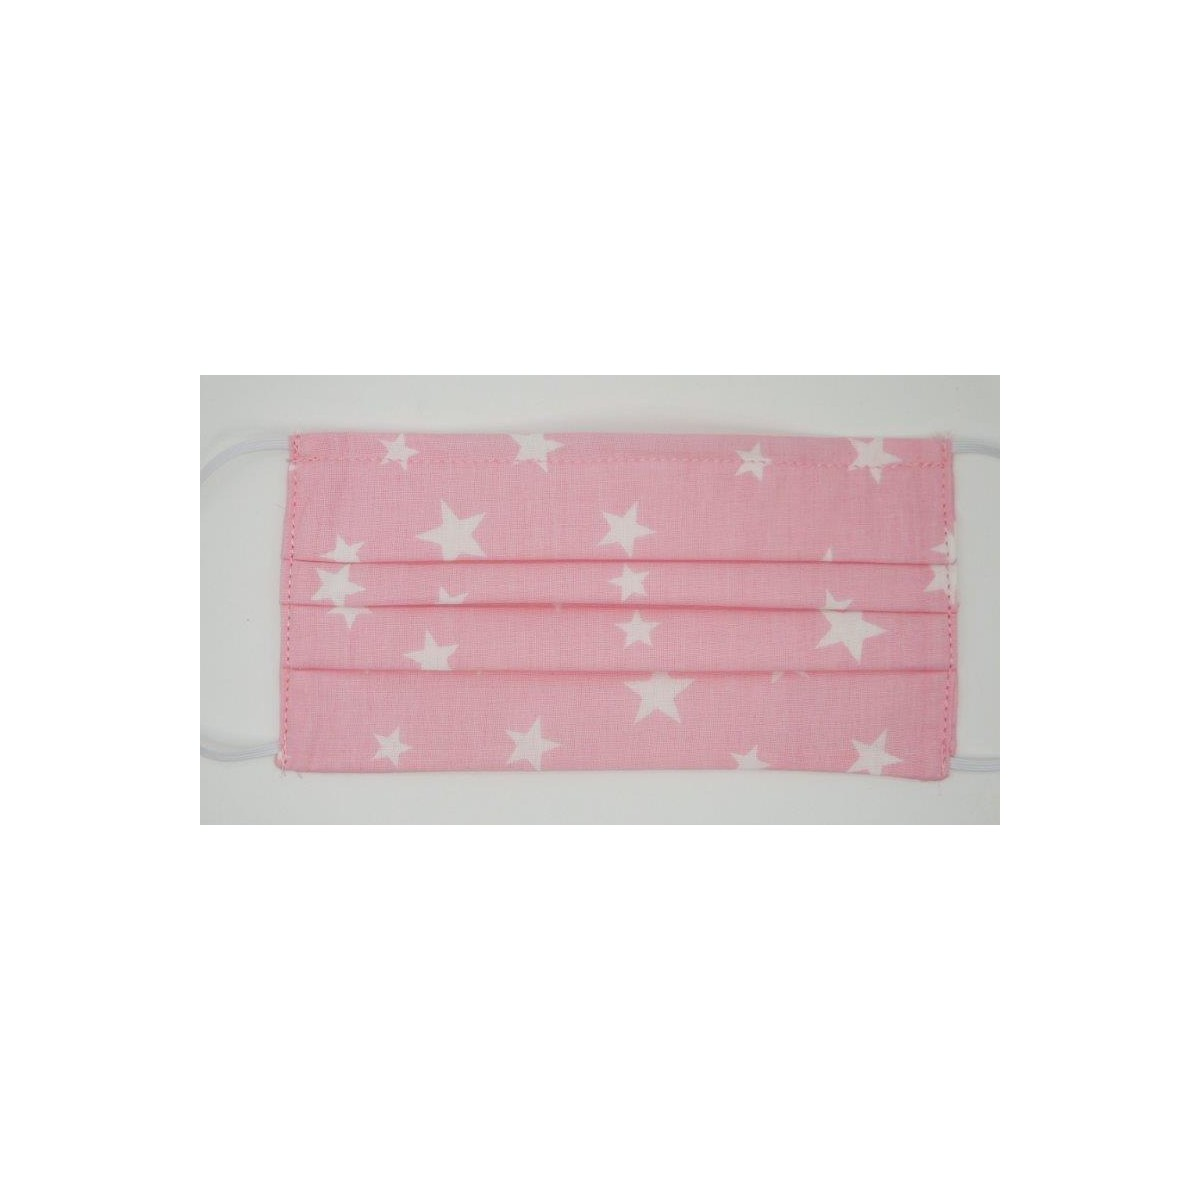 Masca protectie,lavabila - set 5 buc.MAFS340 PINK/WH.STARS